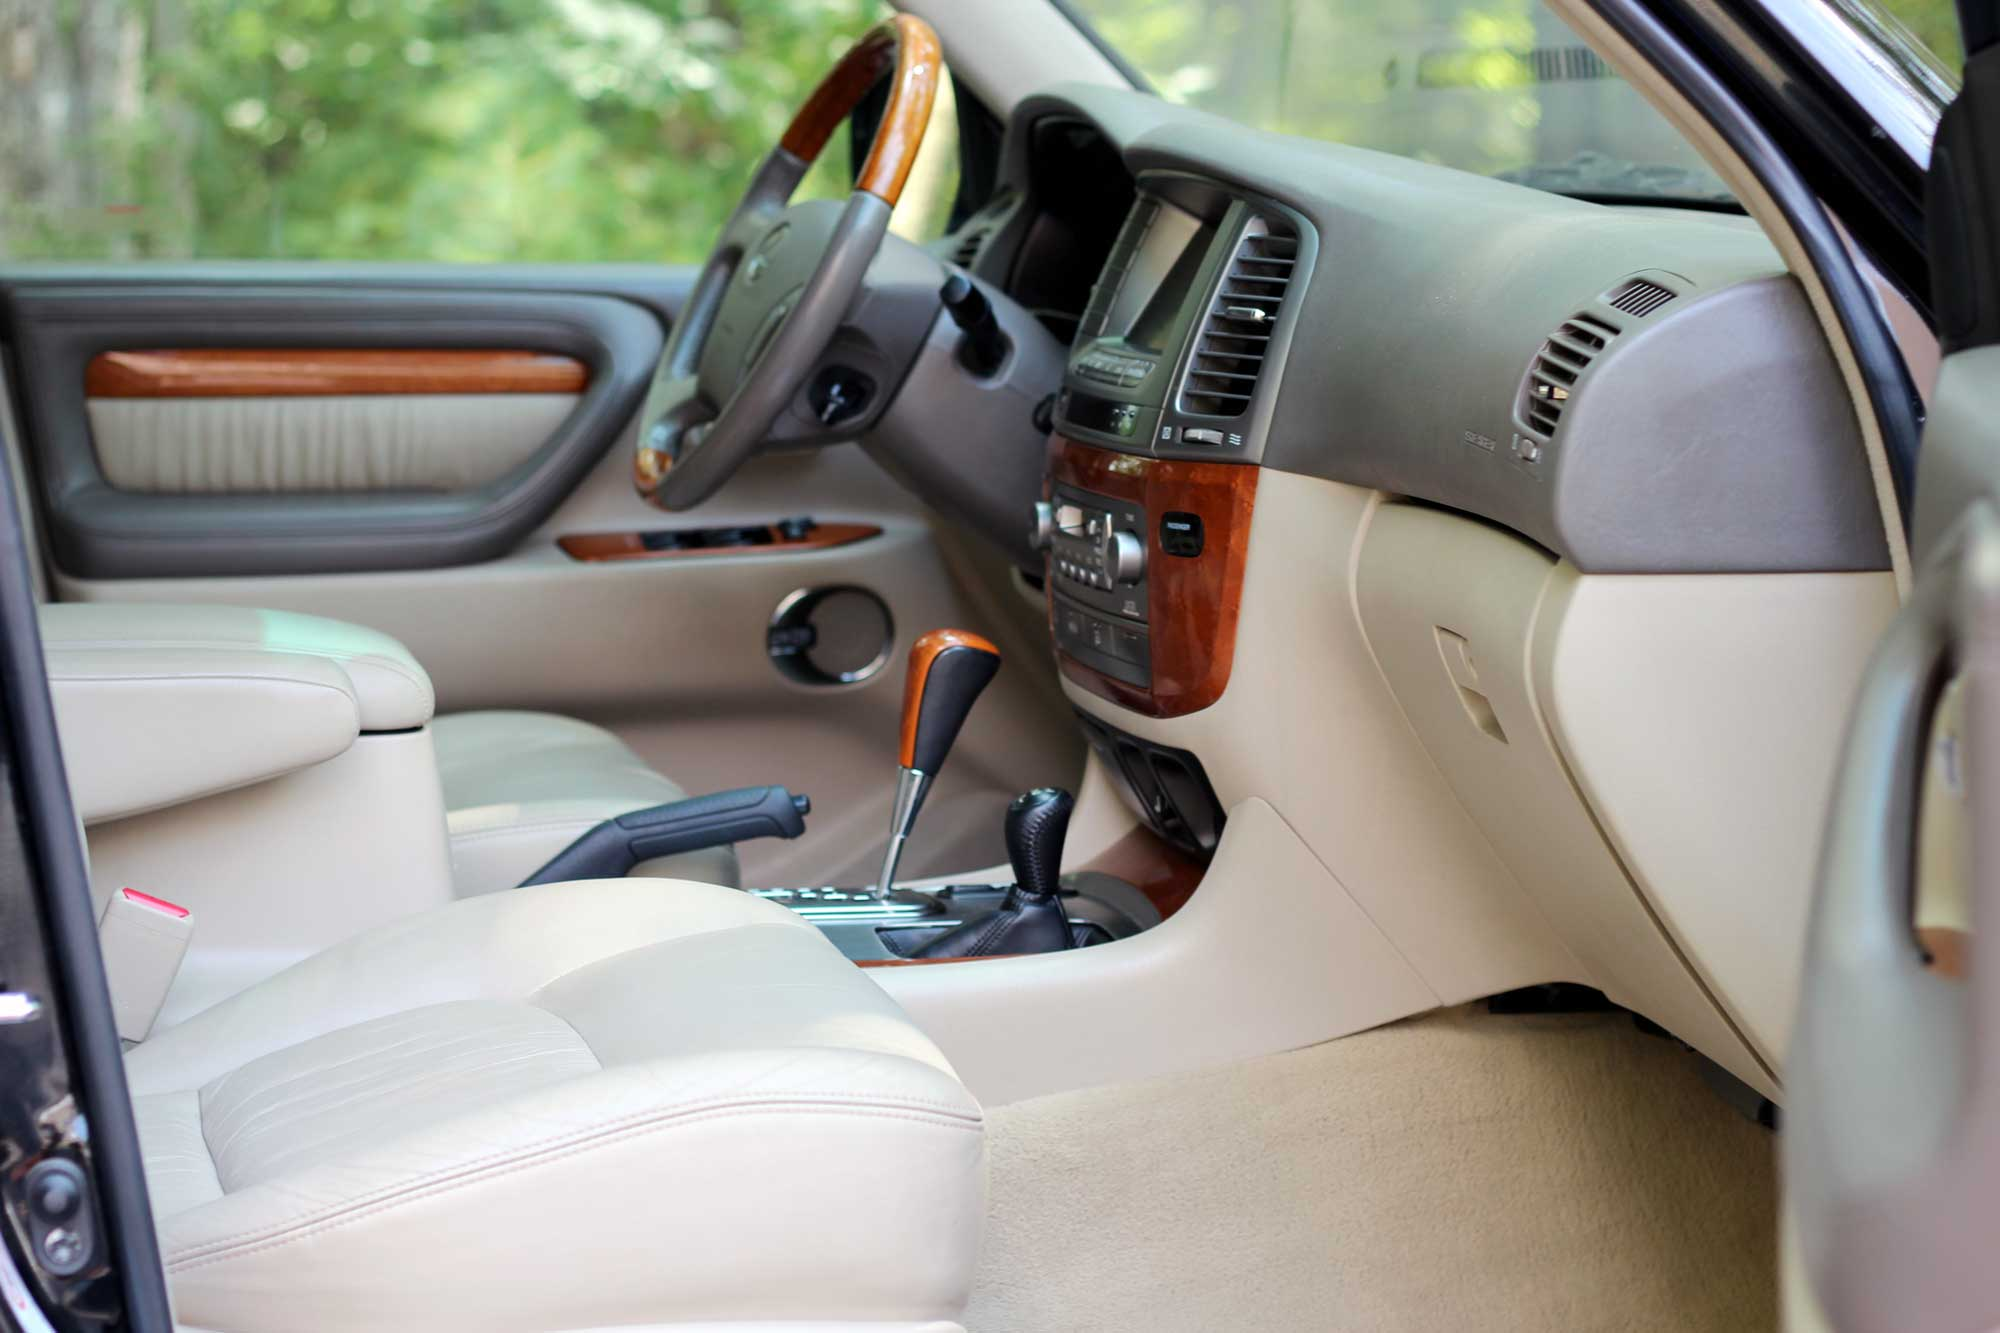 2006 Lexus LX470 - SOLD - NICANORTH